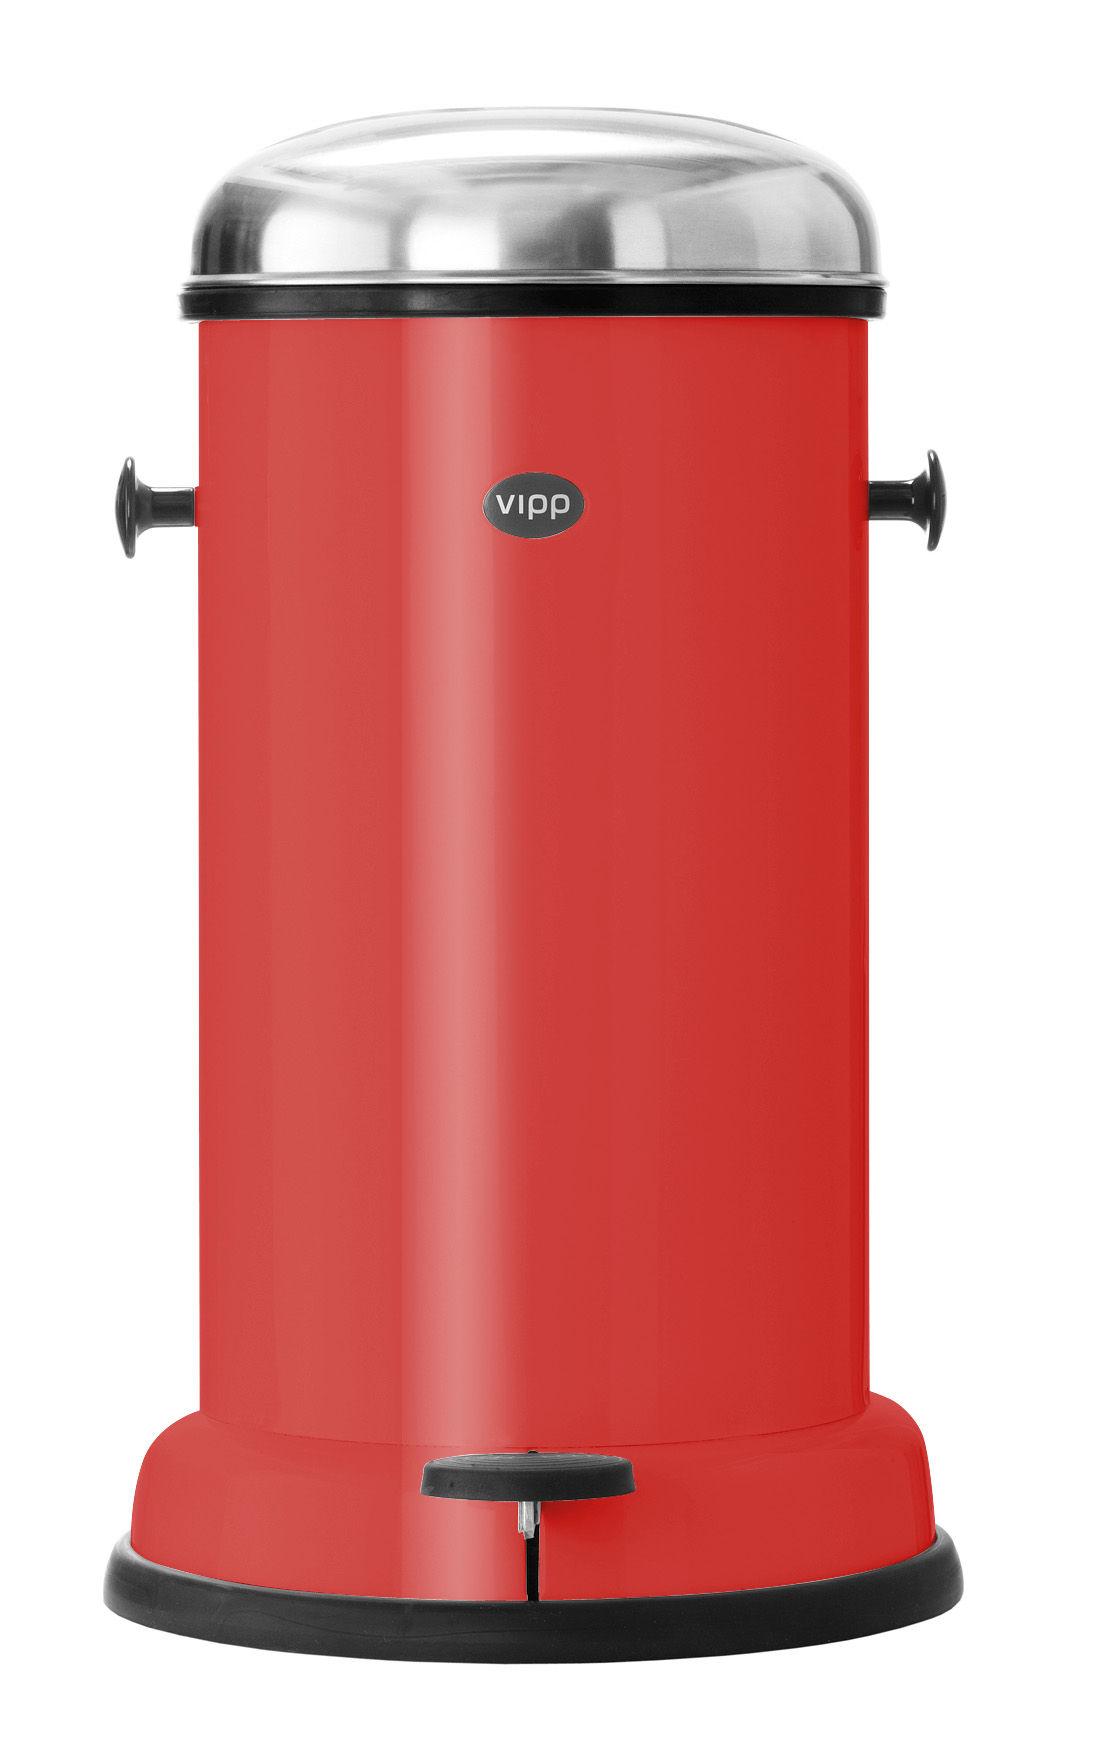 Poubelle Vipp poubelle vipp15 - rising red / 14 litres rouge orangé - vipp | made